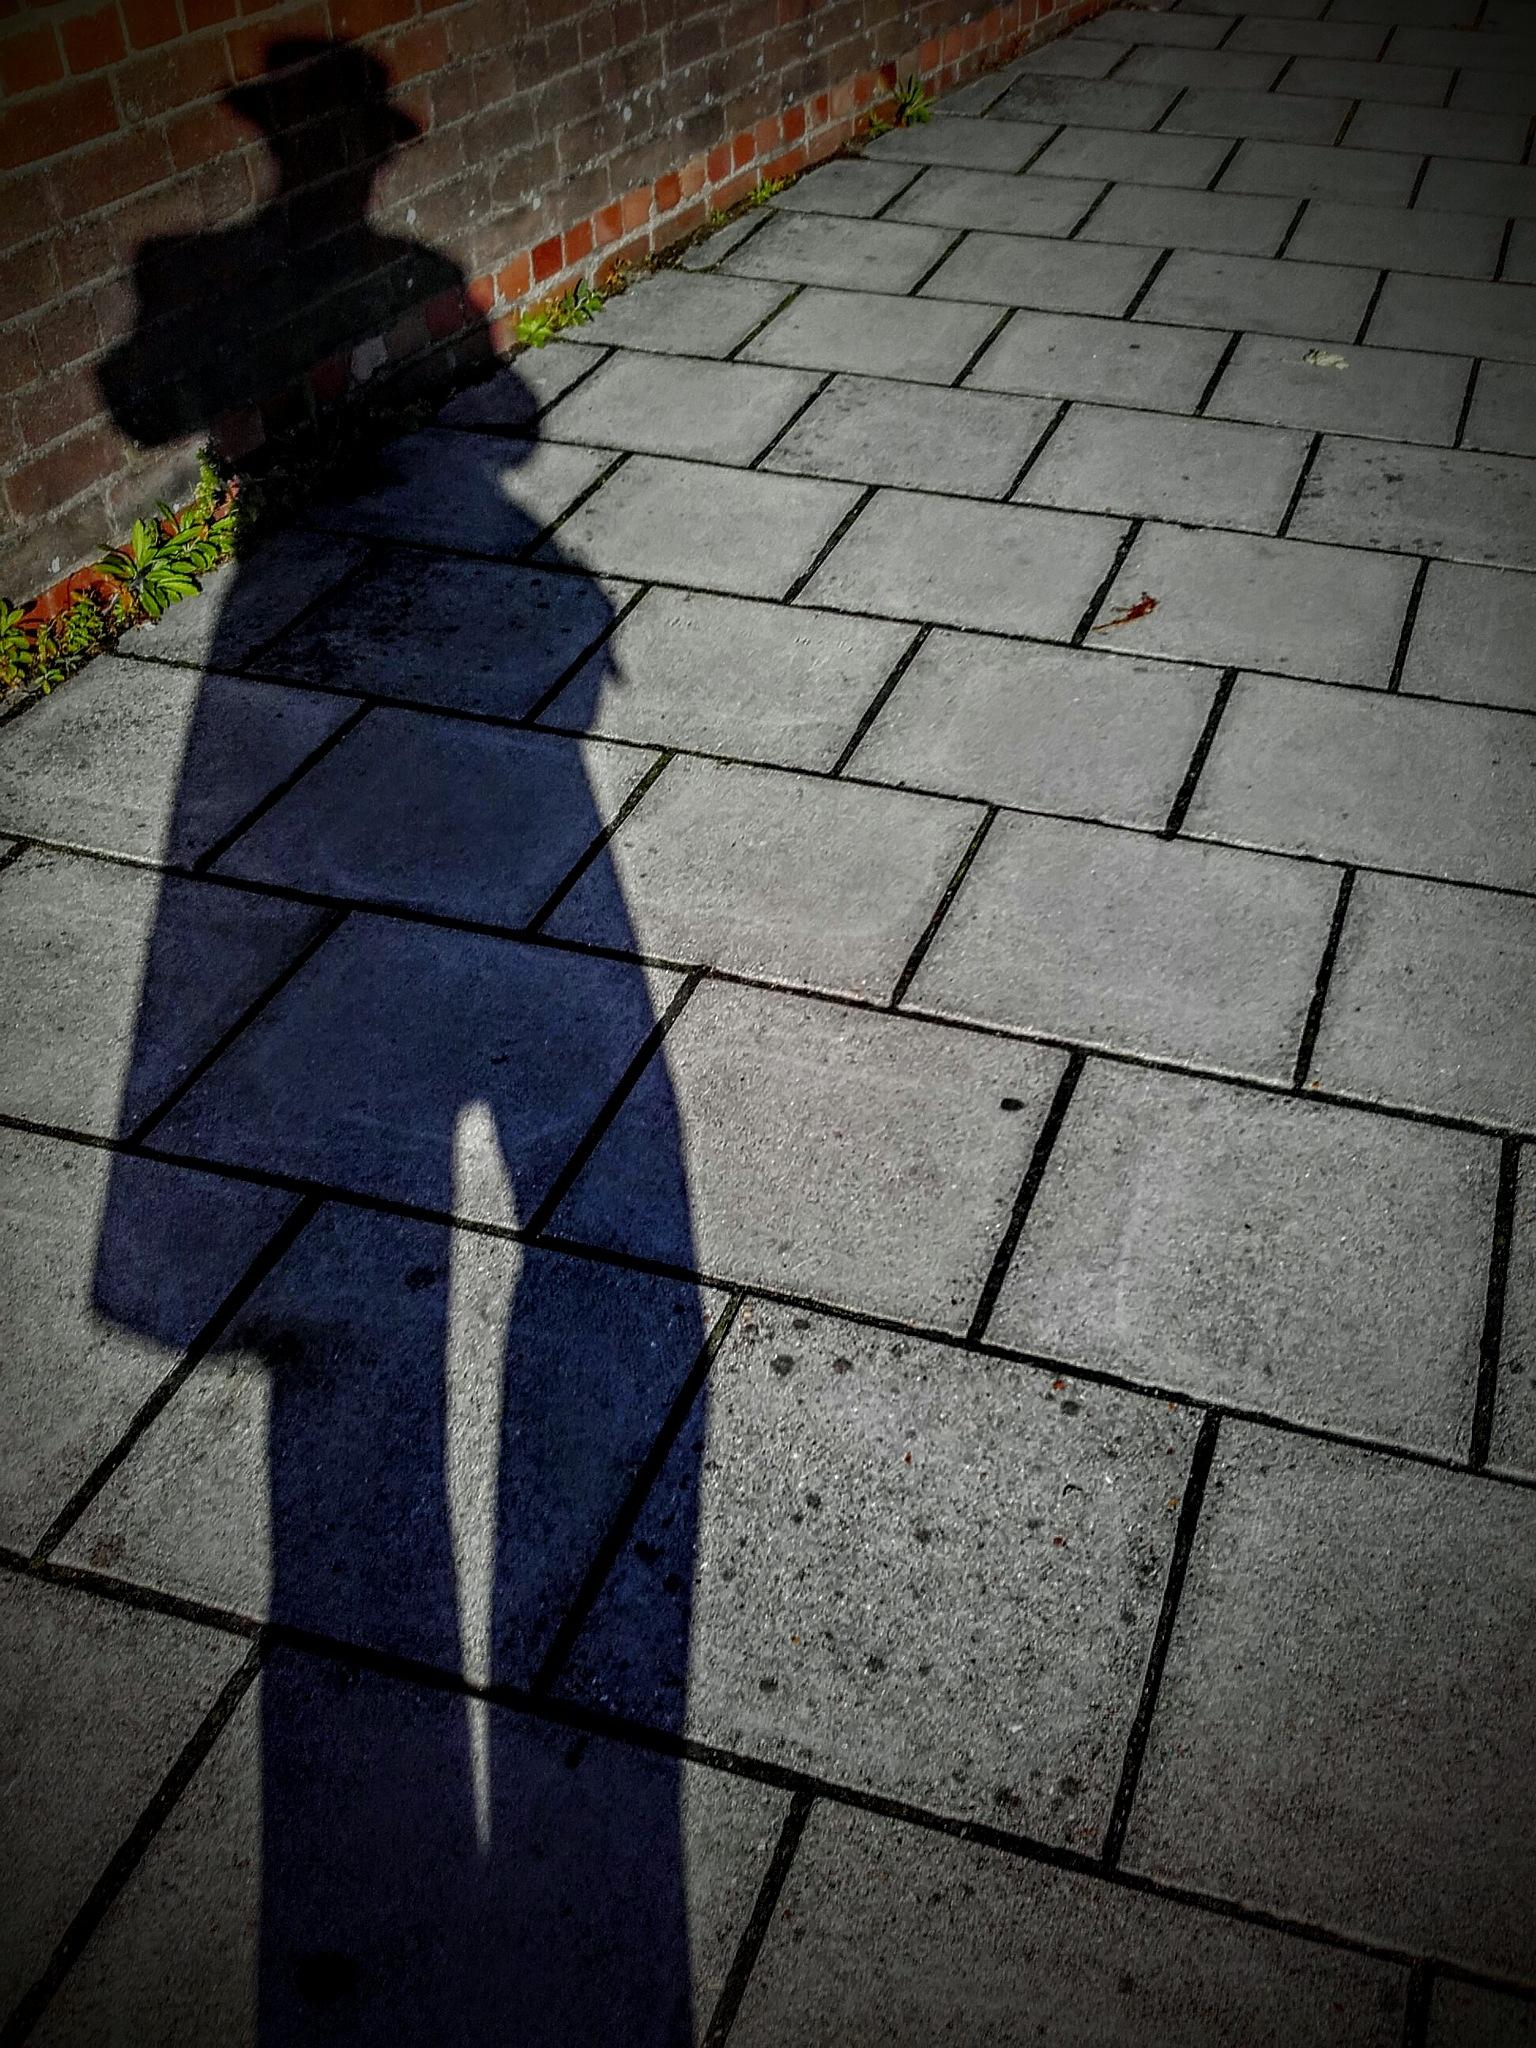 Shadow Play by MartinIngley